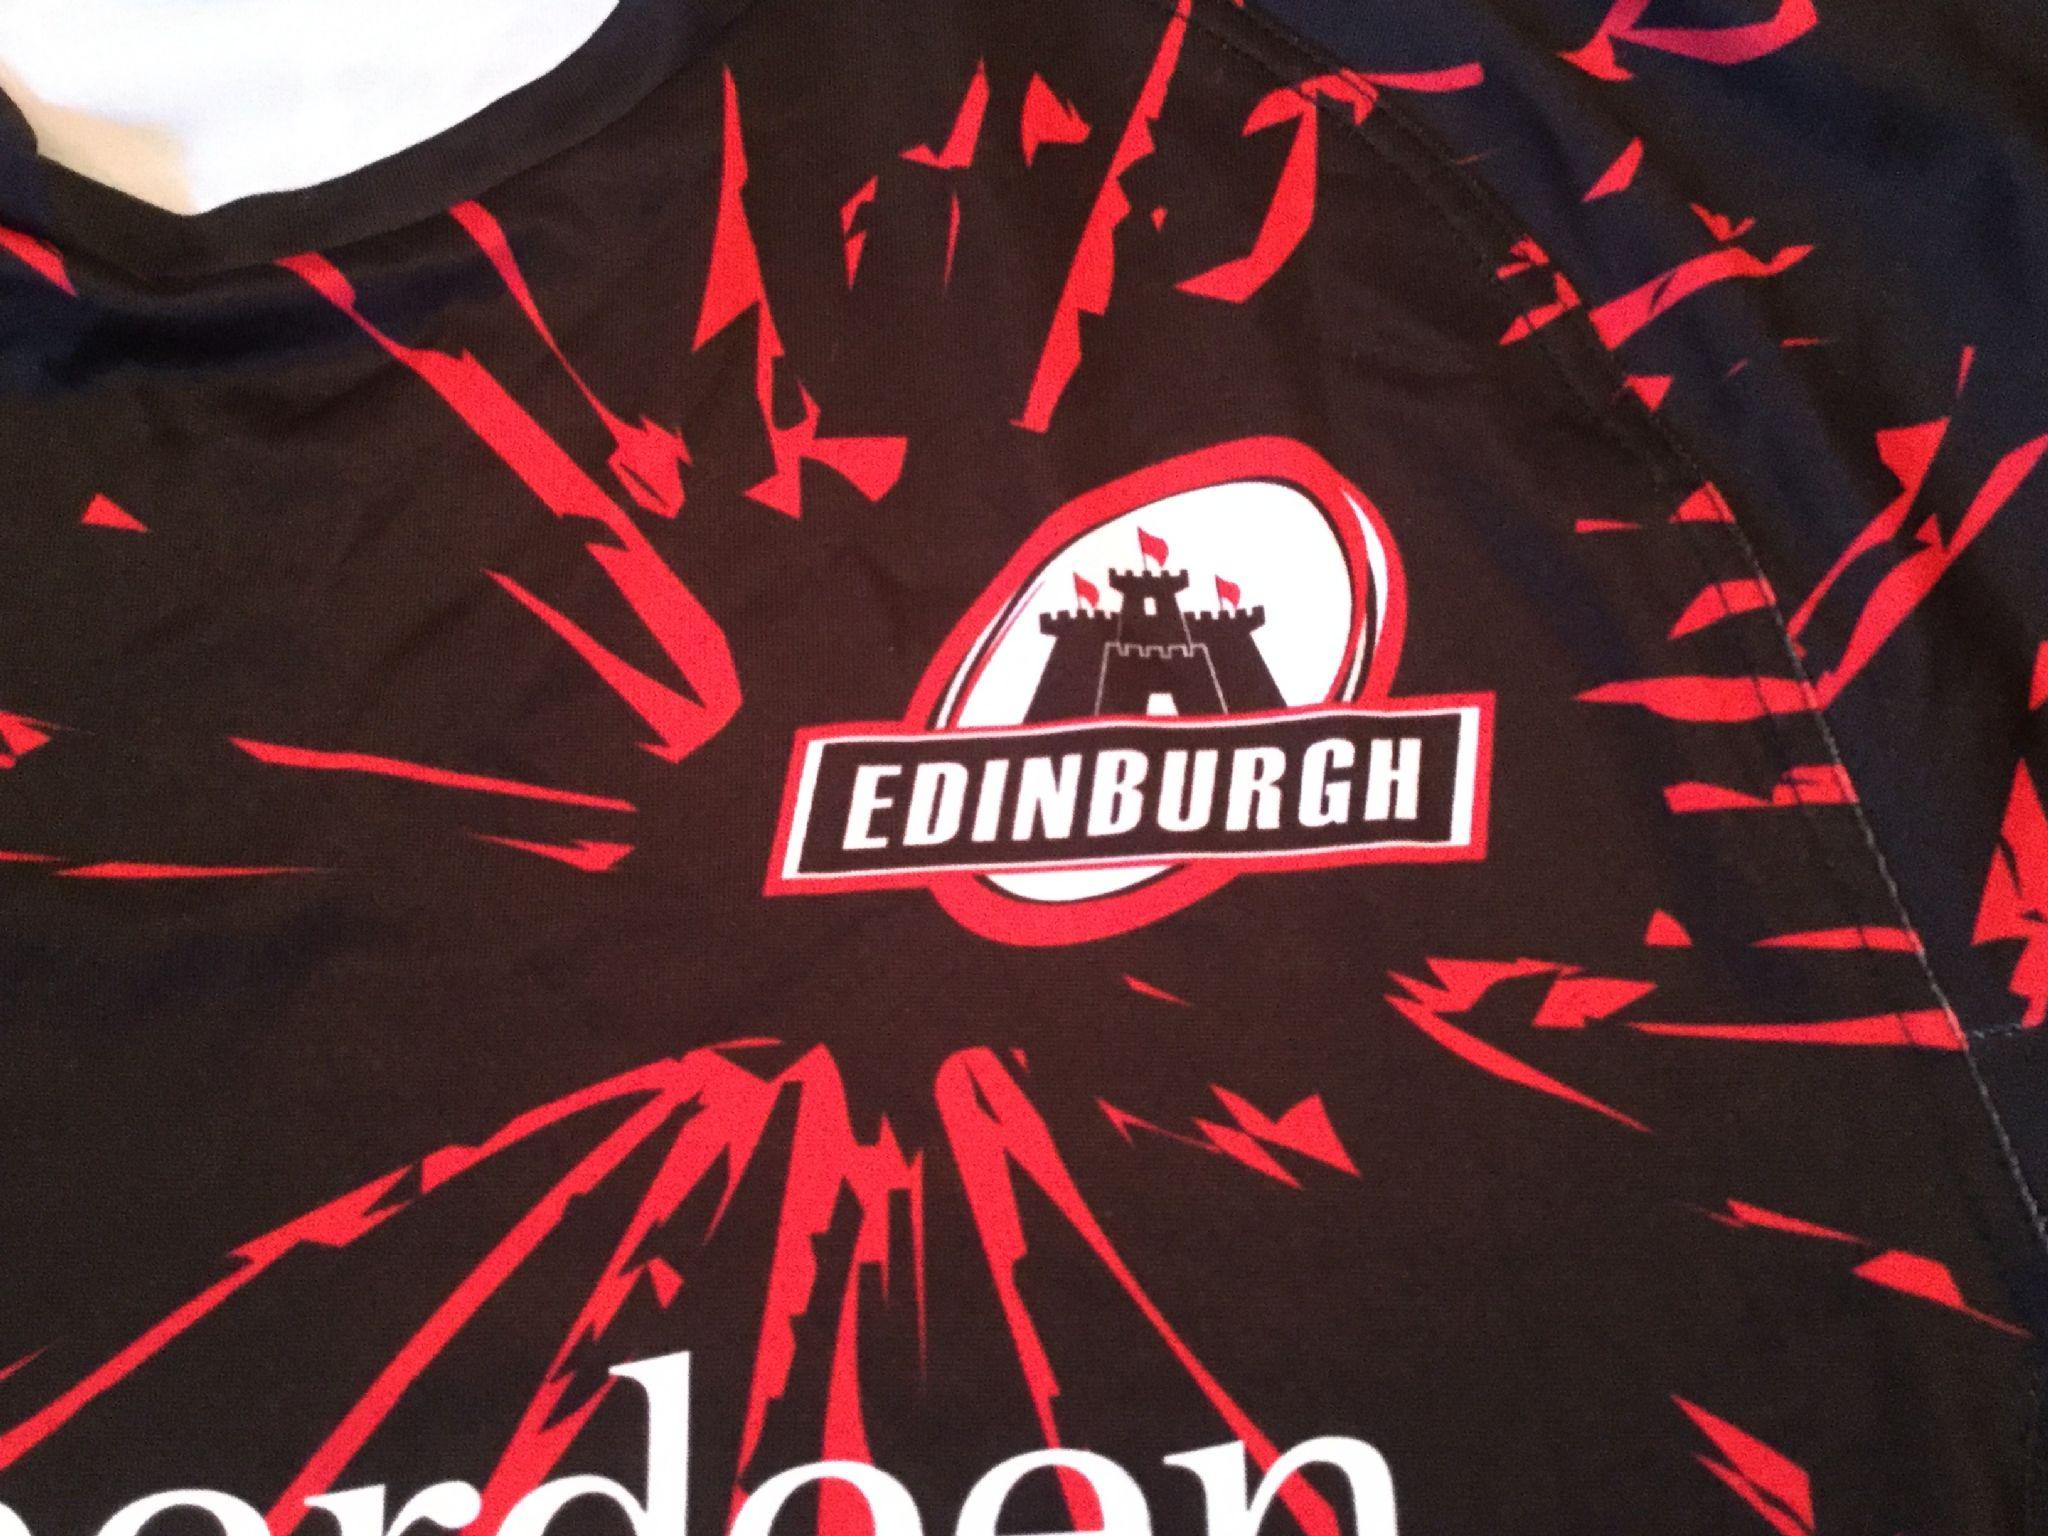 Classic Rugby Shirts 2012 Edinburgh Vintage Old Jerseys